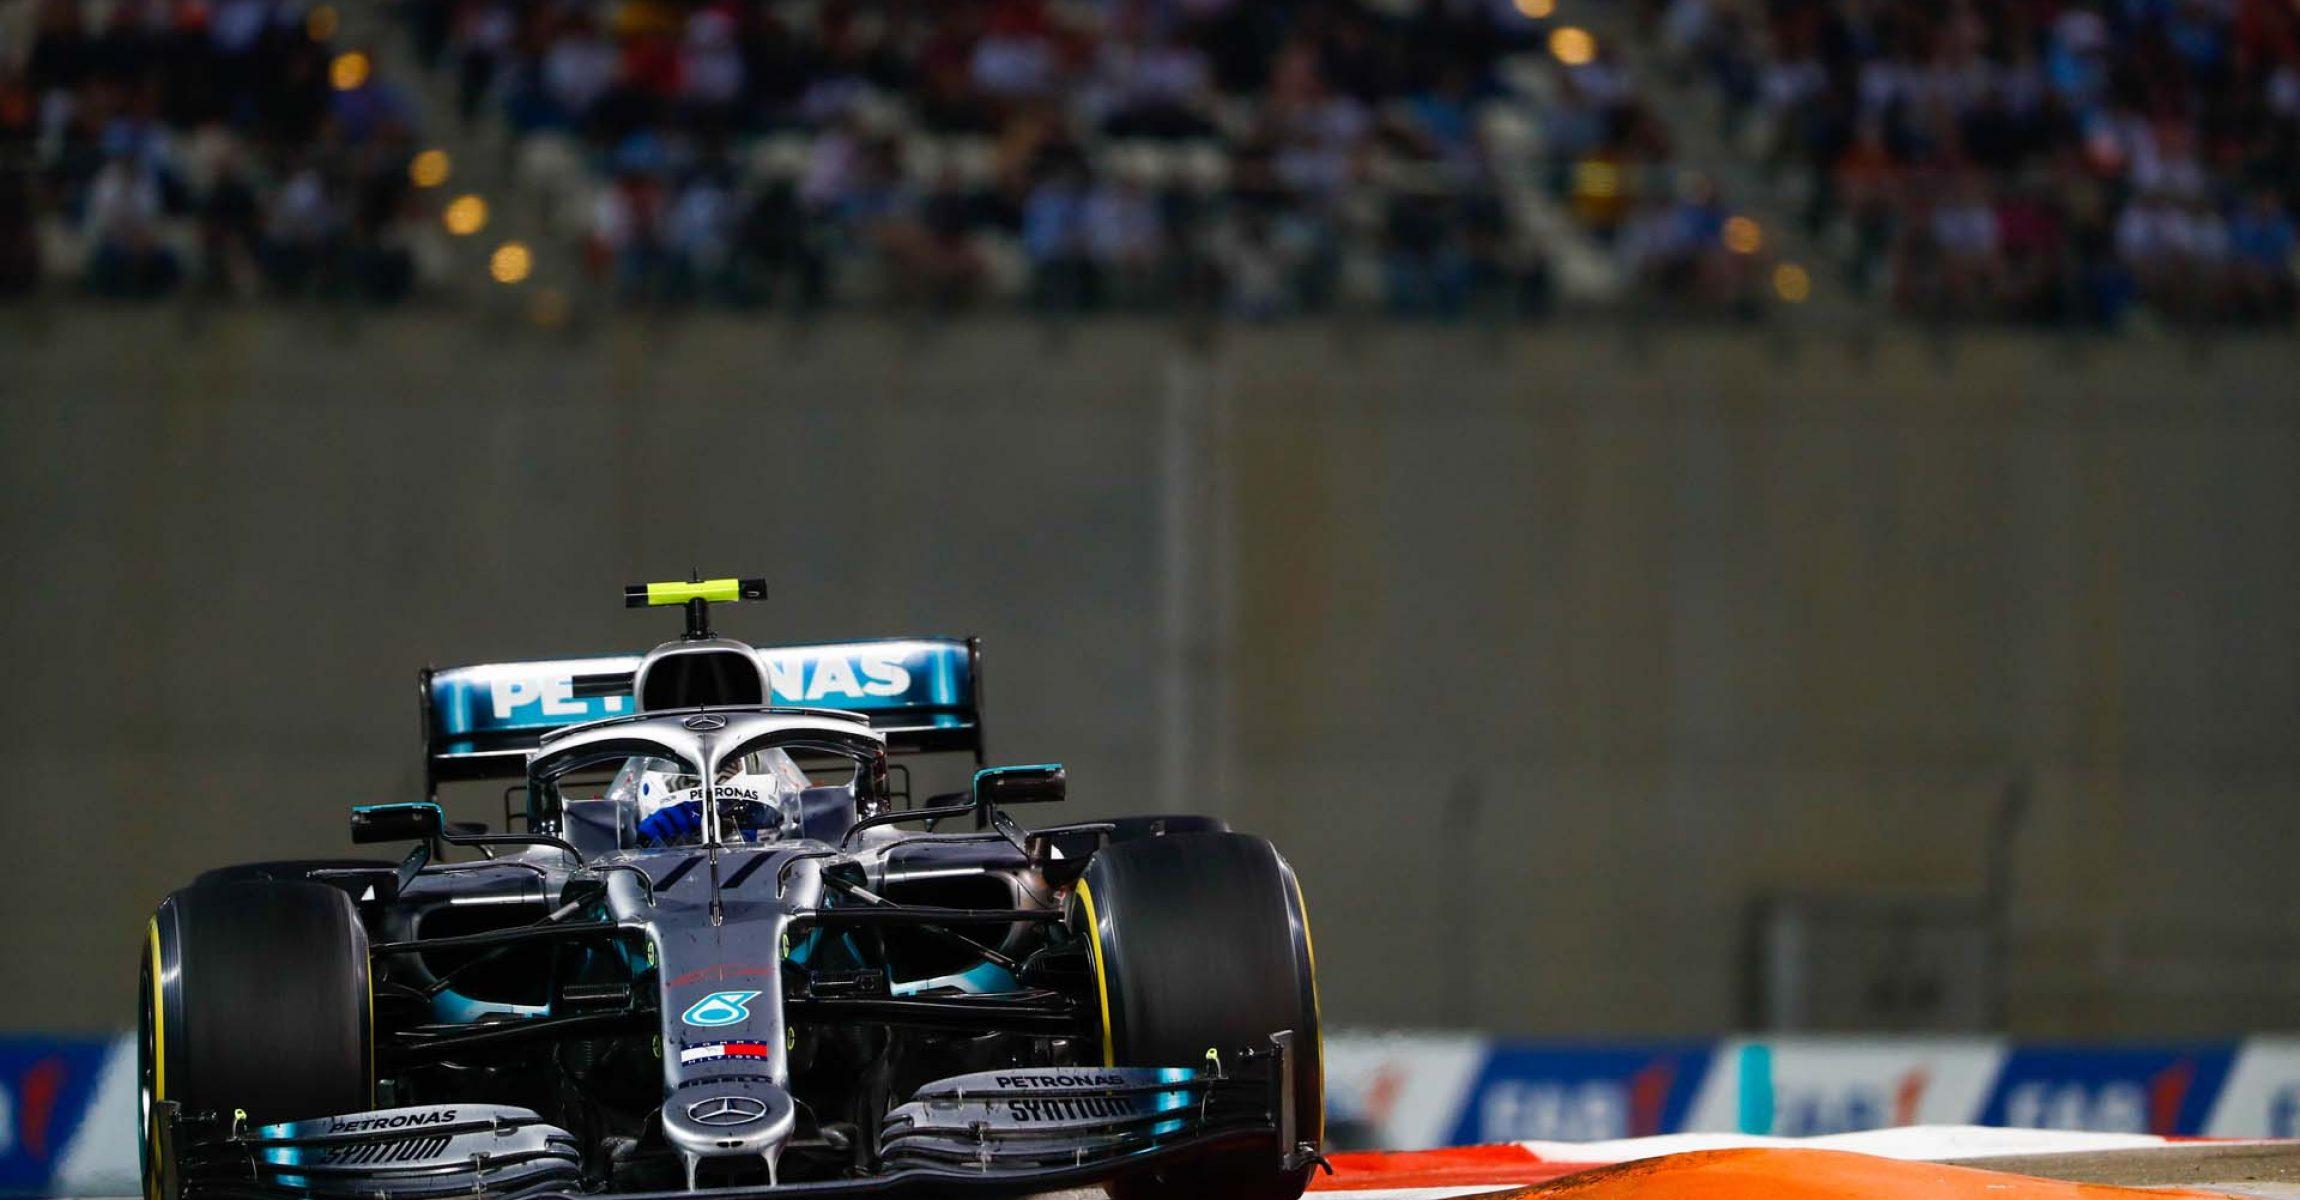 2019 Abu Dhabi Grand Prix, Sunday - LAT Images Valtteri Bottas Mercedes